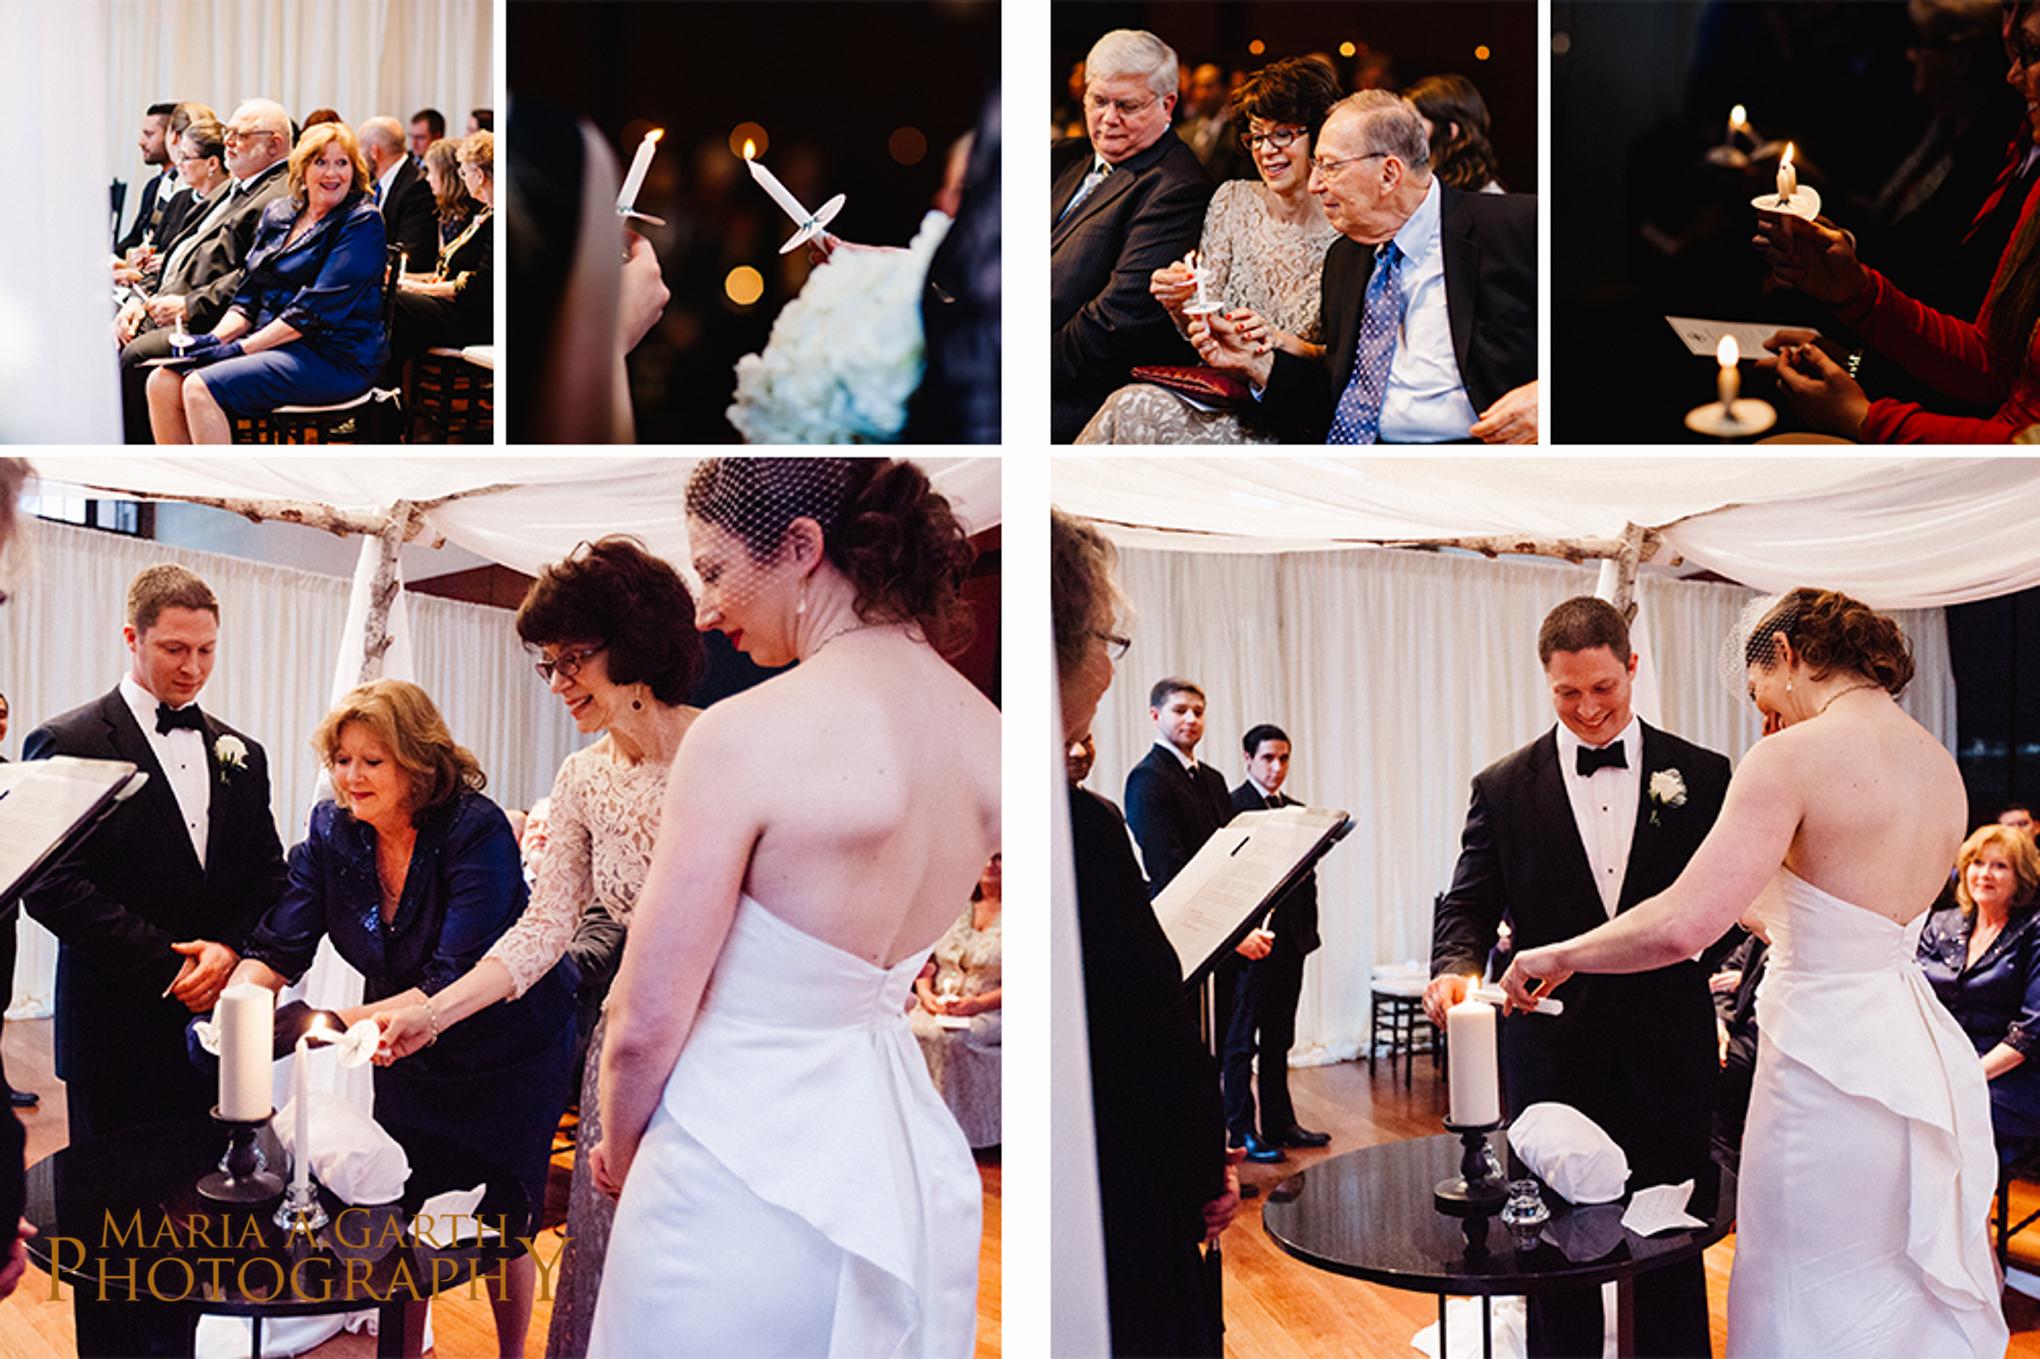 Georgetown Weddings, DC Wedding Photography, Weddings at the Ritz in DC_019.jpg